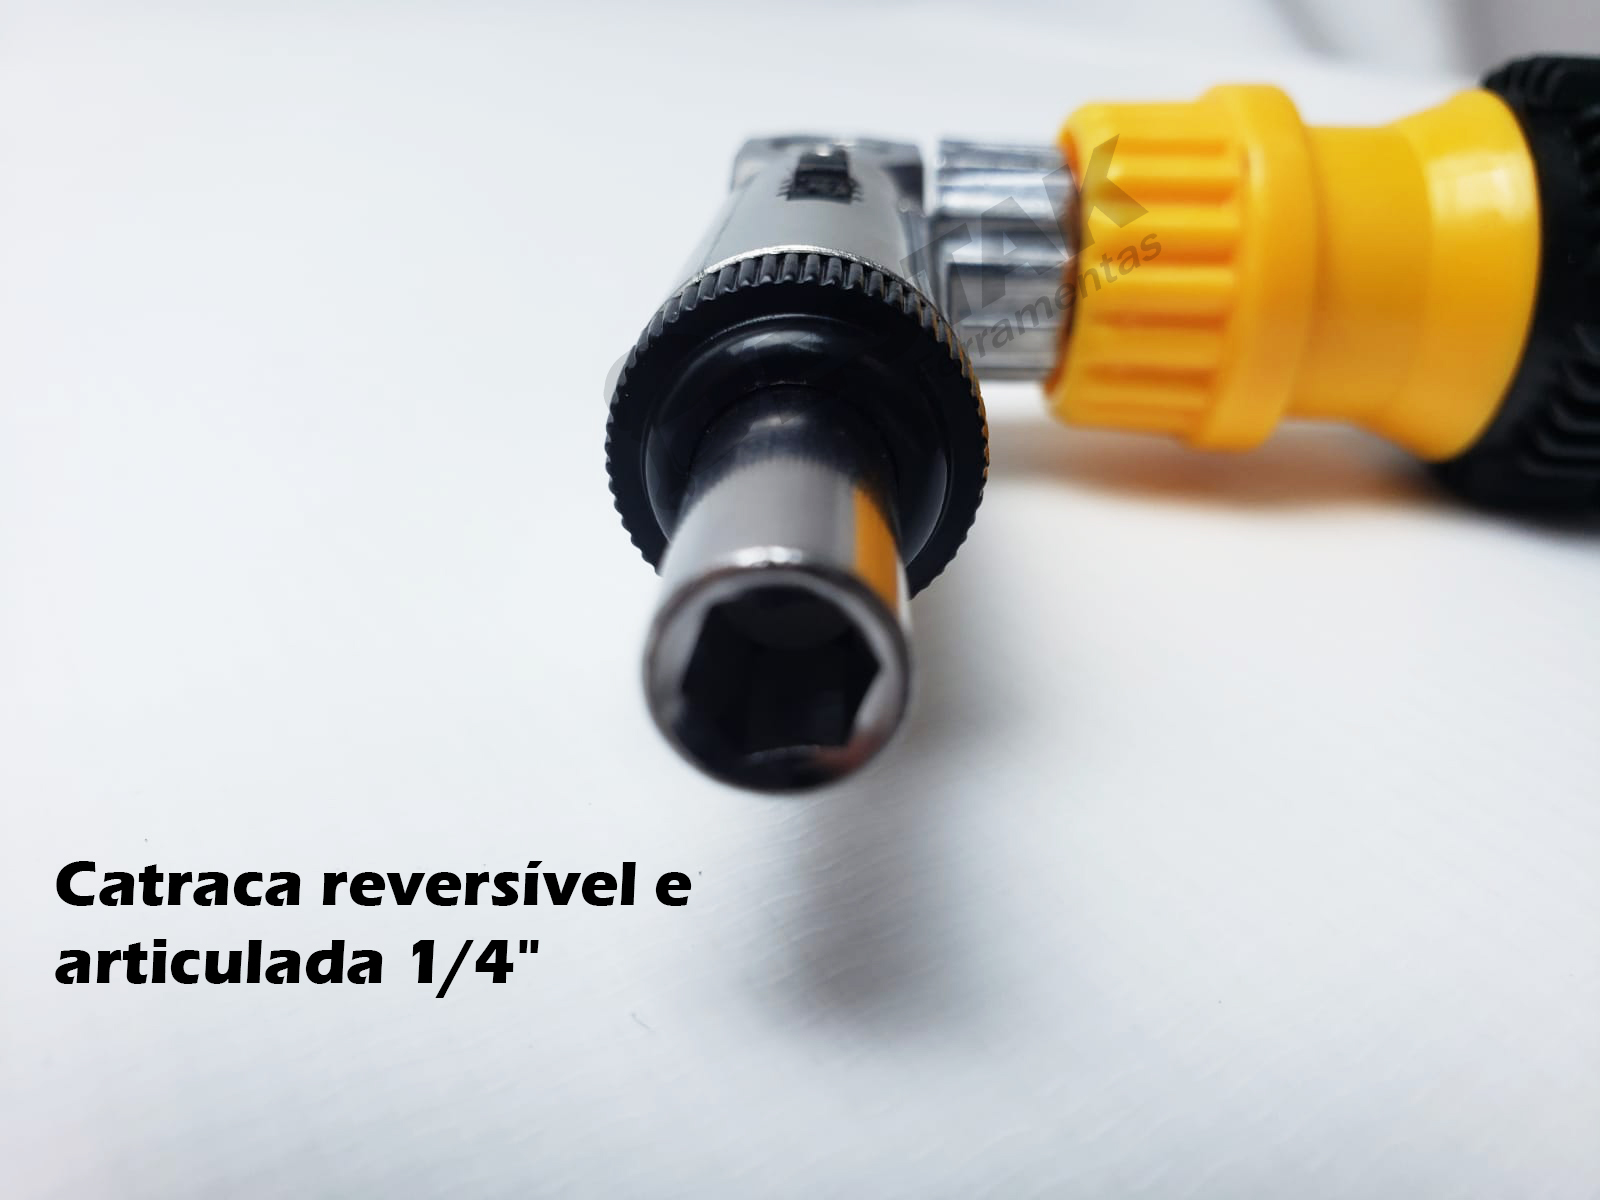 Jogo Soquetes 40pç 1/4 Kit Maleta Chave Boca Fixa + Brinde